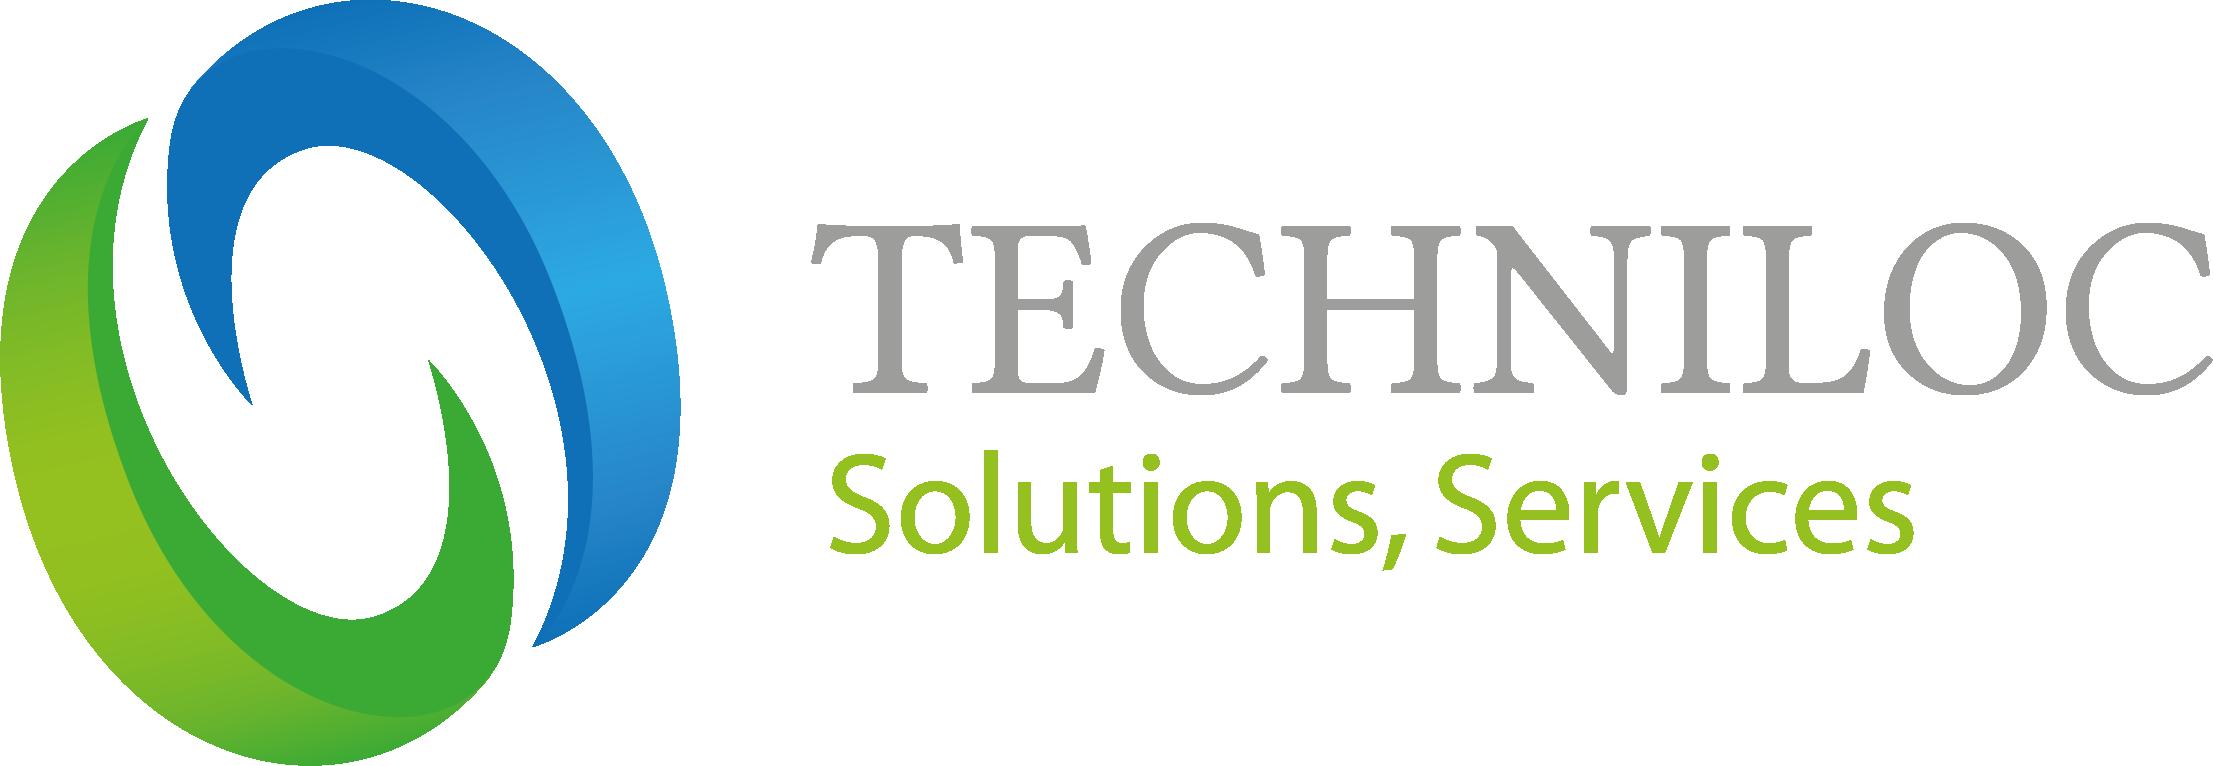 W techniloc logo